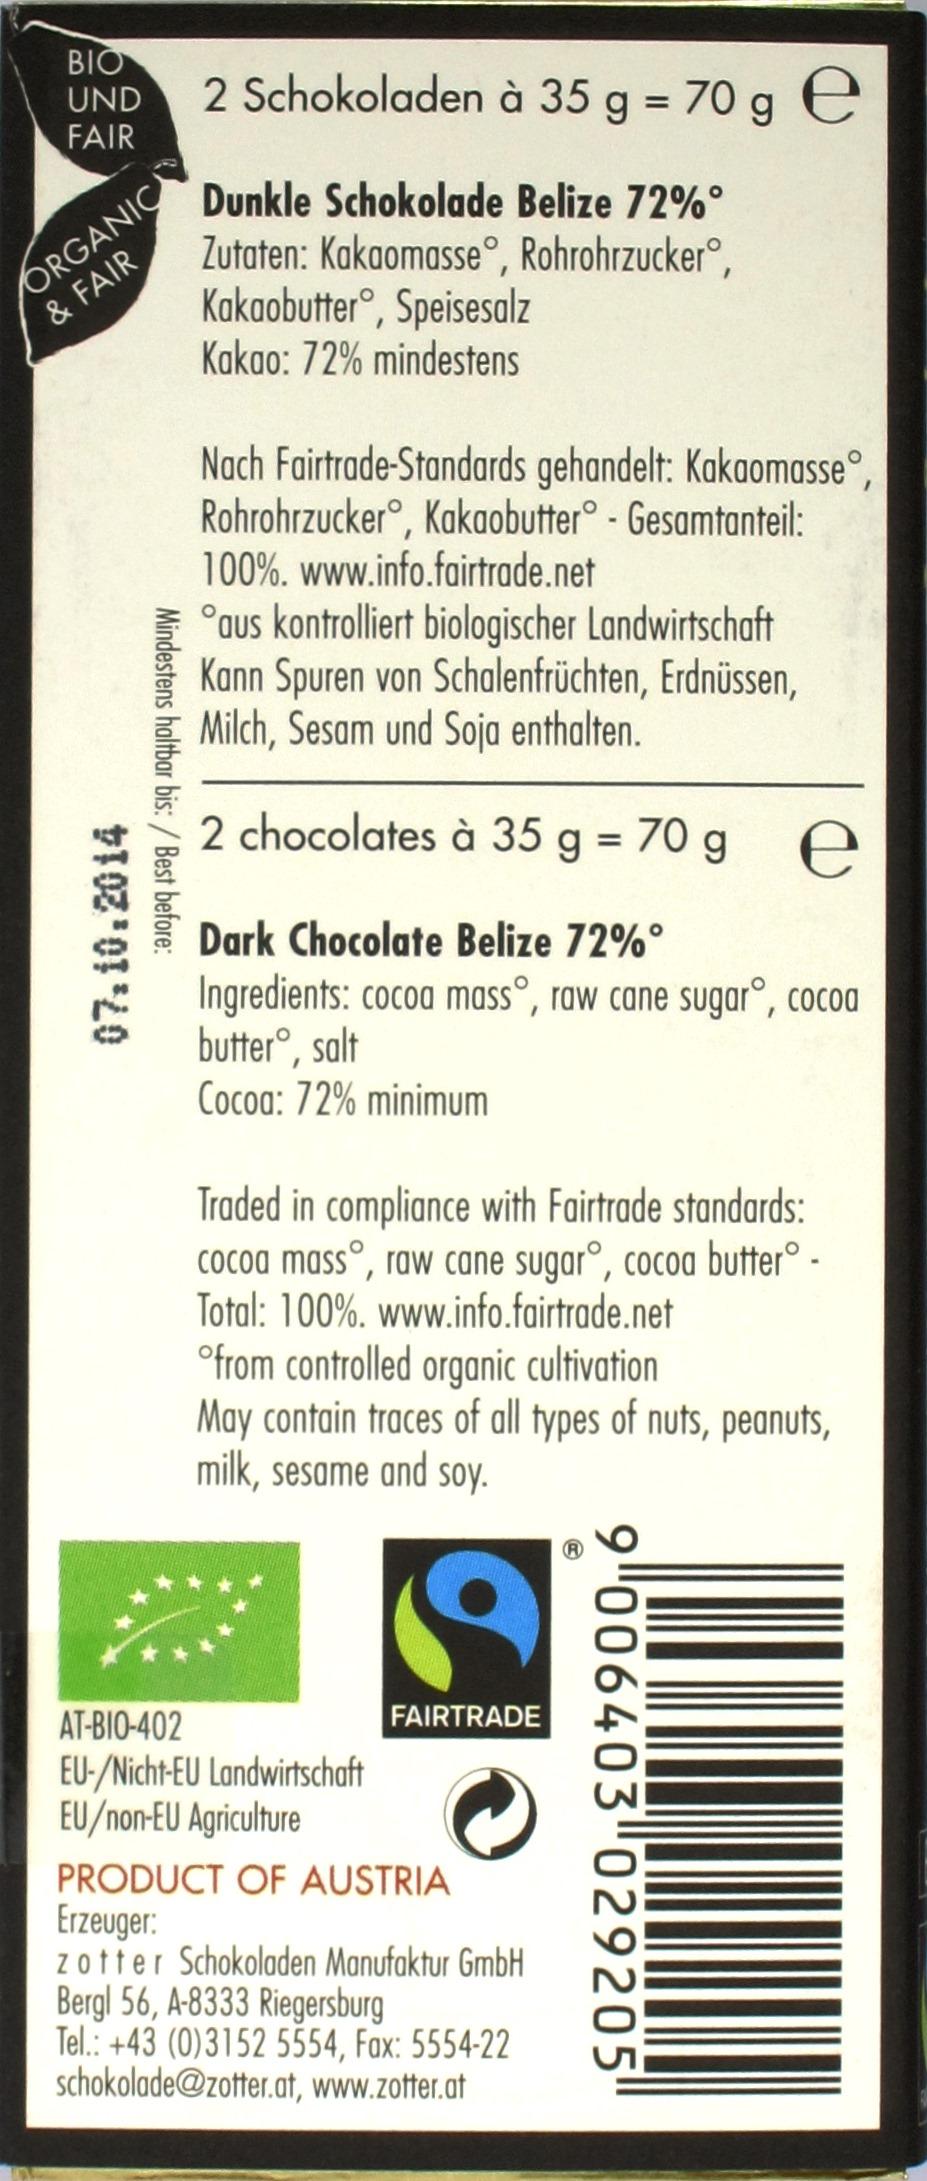 Zotter-Bitterschokolade Labooko Belize Spezial 72%, Rückseite